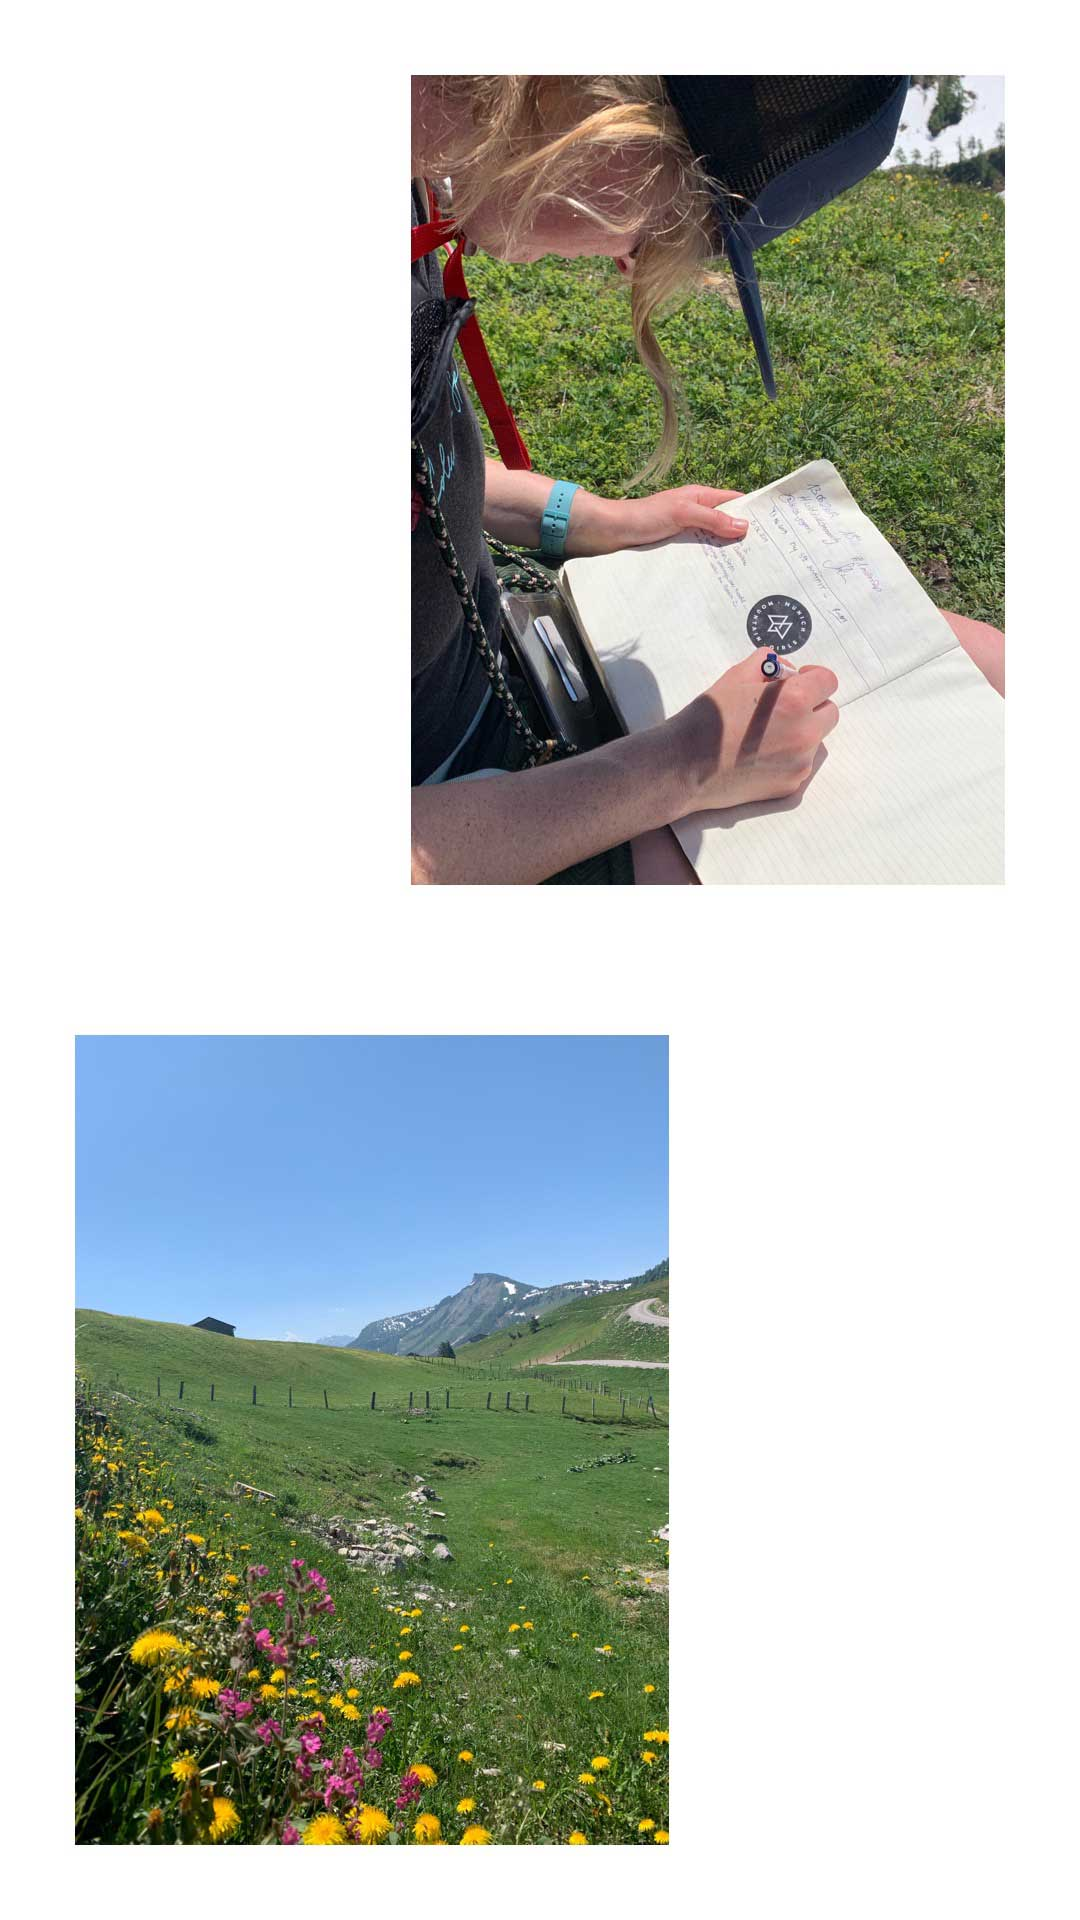 berge-seen-trail-tag-3-gipfelbuch-munichmountaingirls